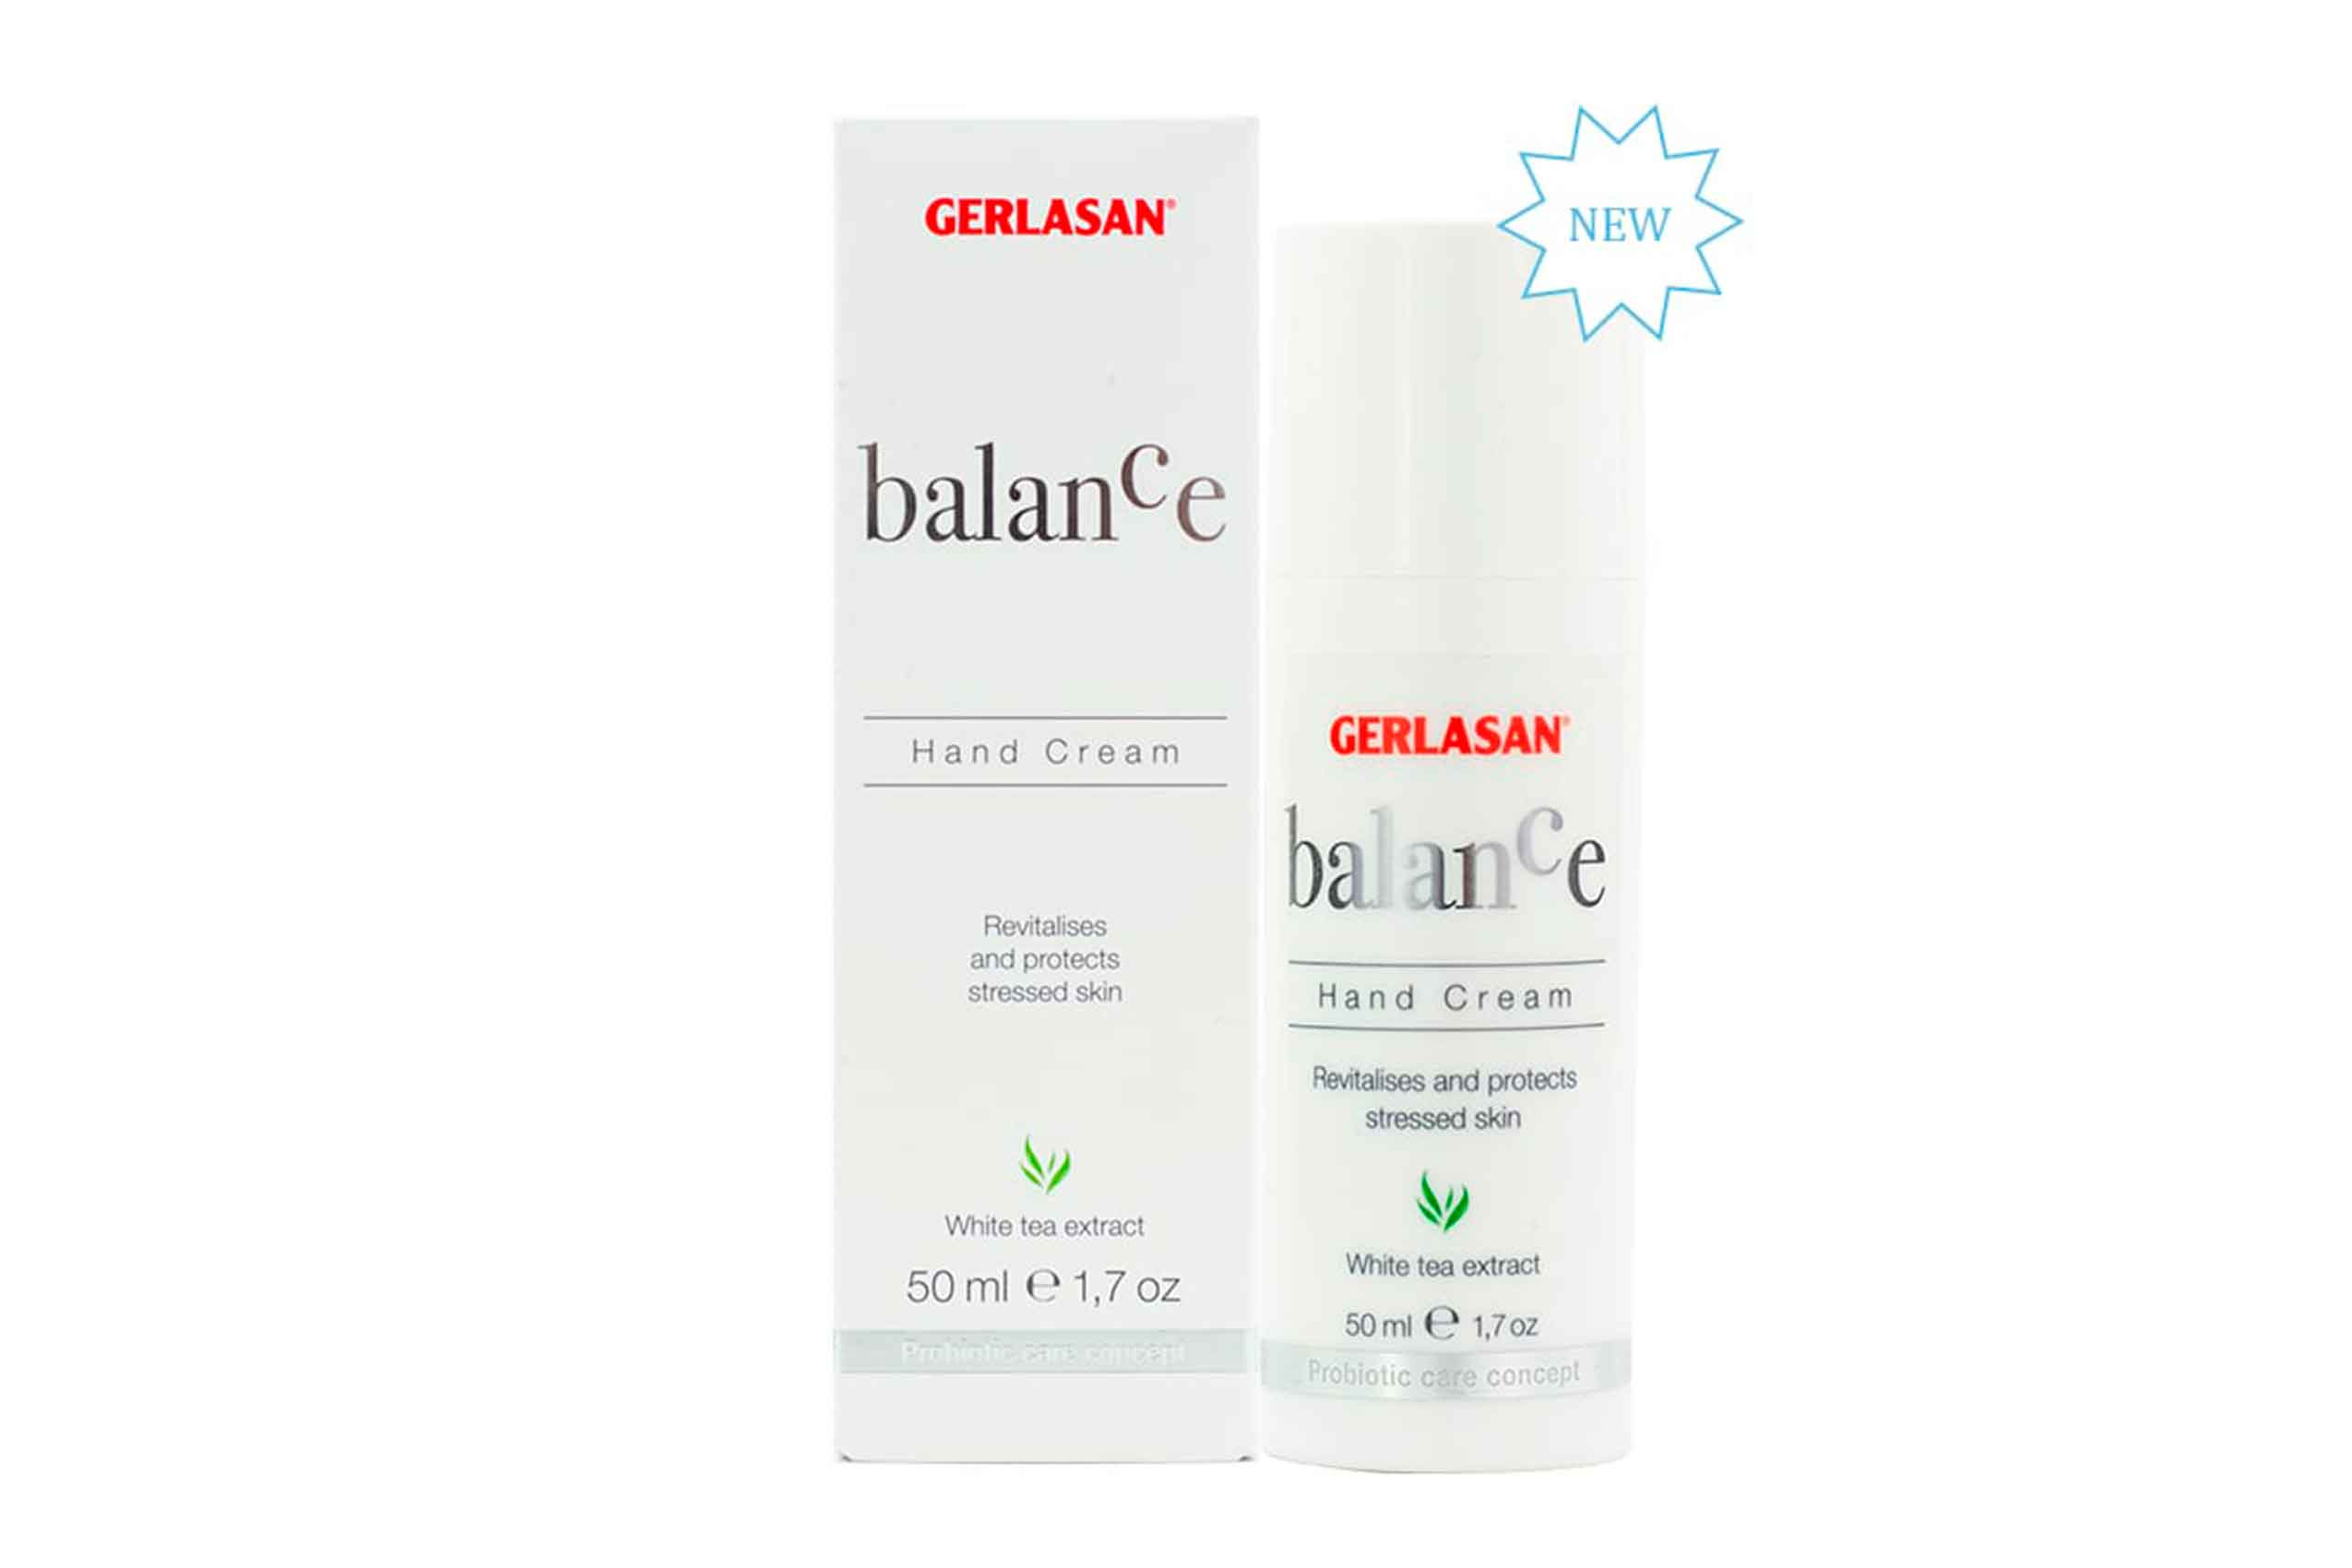 Gehwol Gerlasan Balance Hand Cream 50 ml